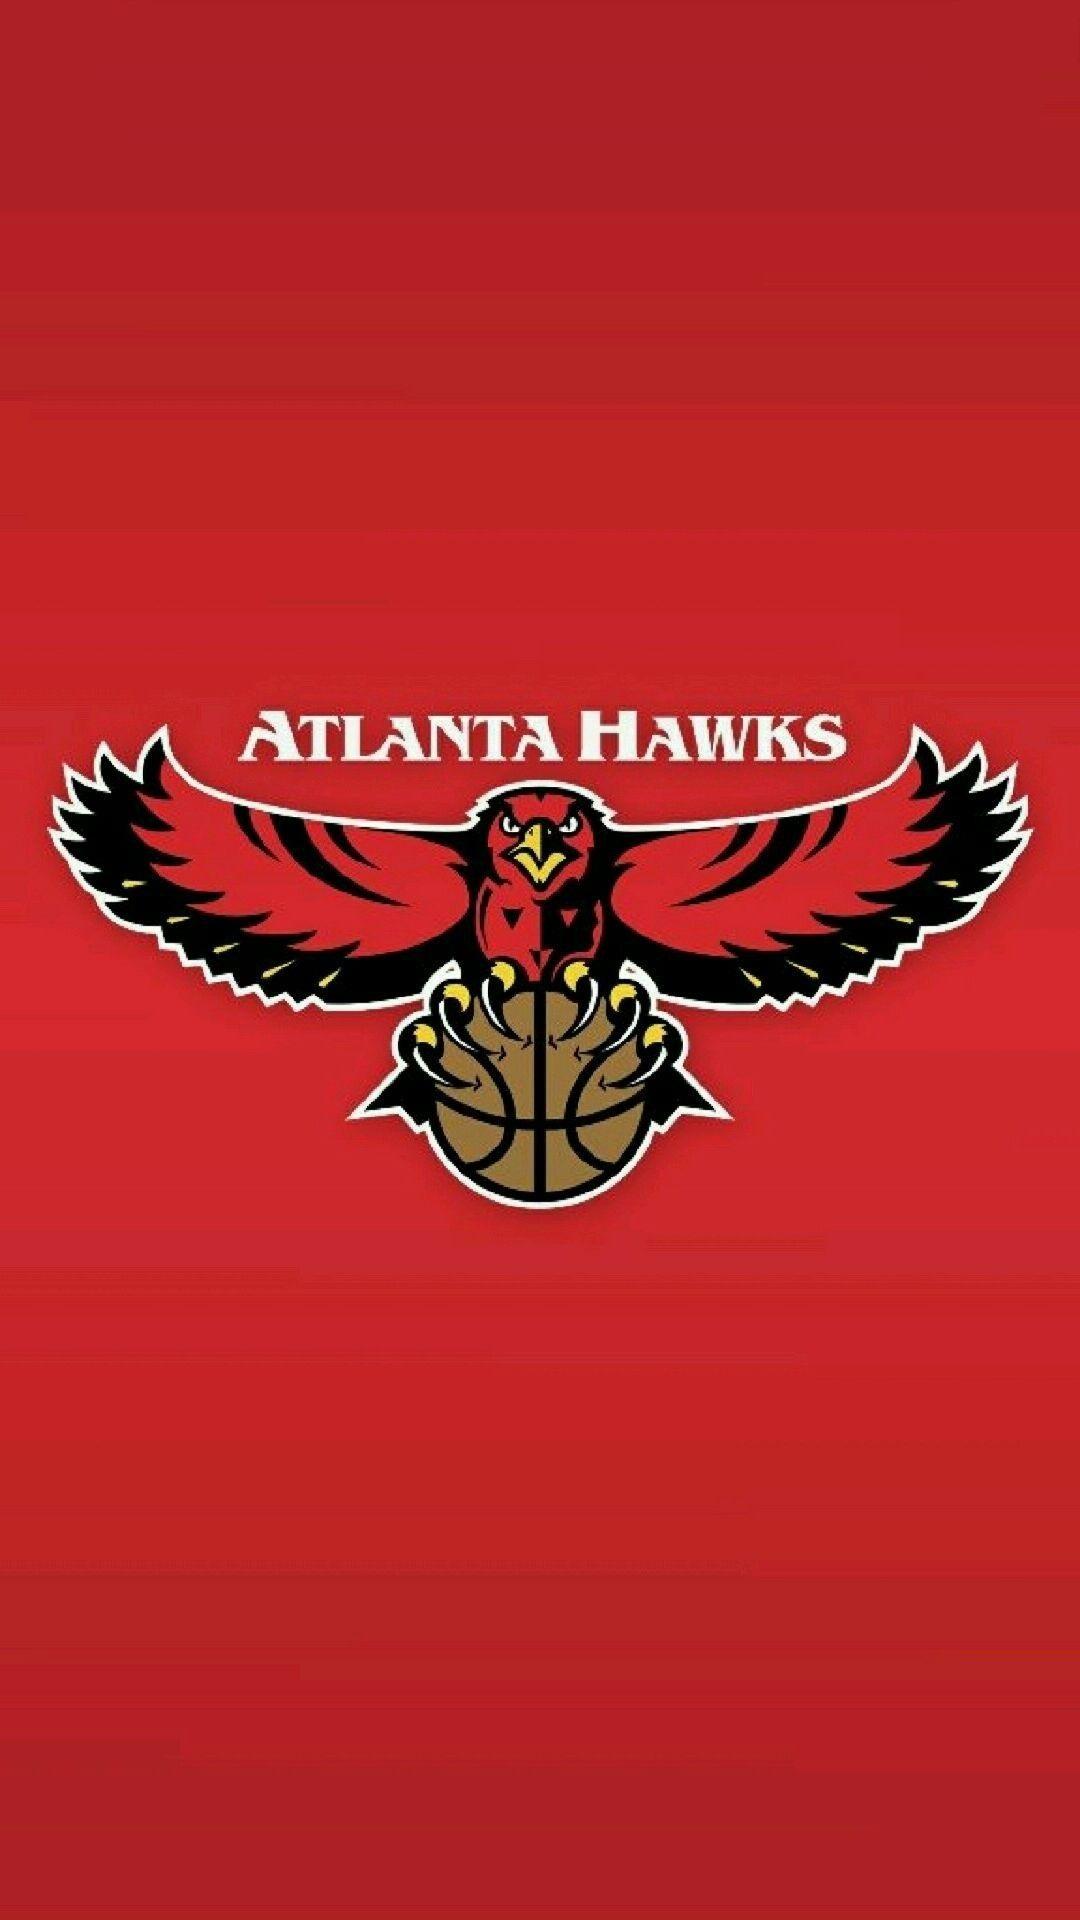 Atlanta Hawks Iphone 6s Plus Wallpaper With High-resolution - Atlanta Hawks Logo 2020 , HD Wallpaper & Backgrounds